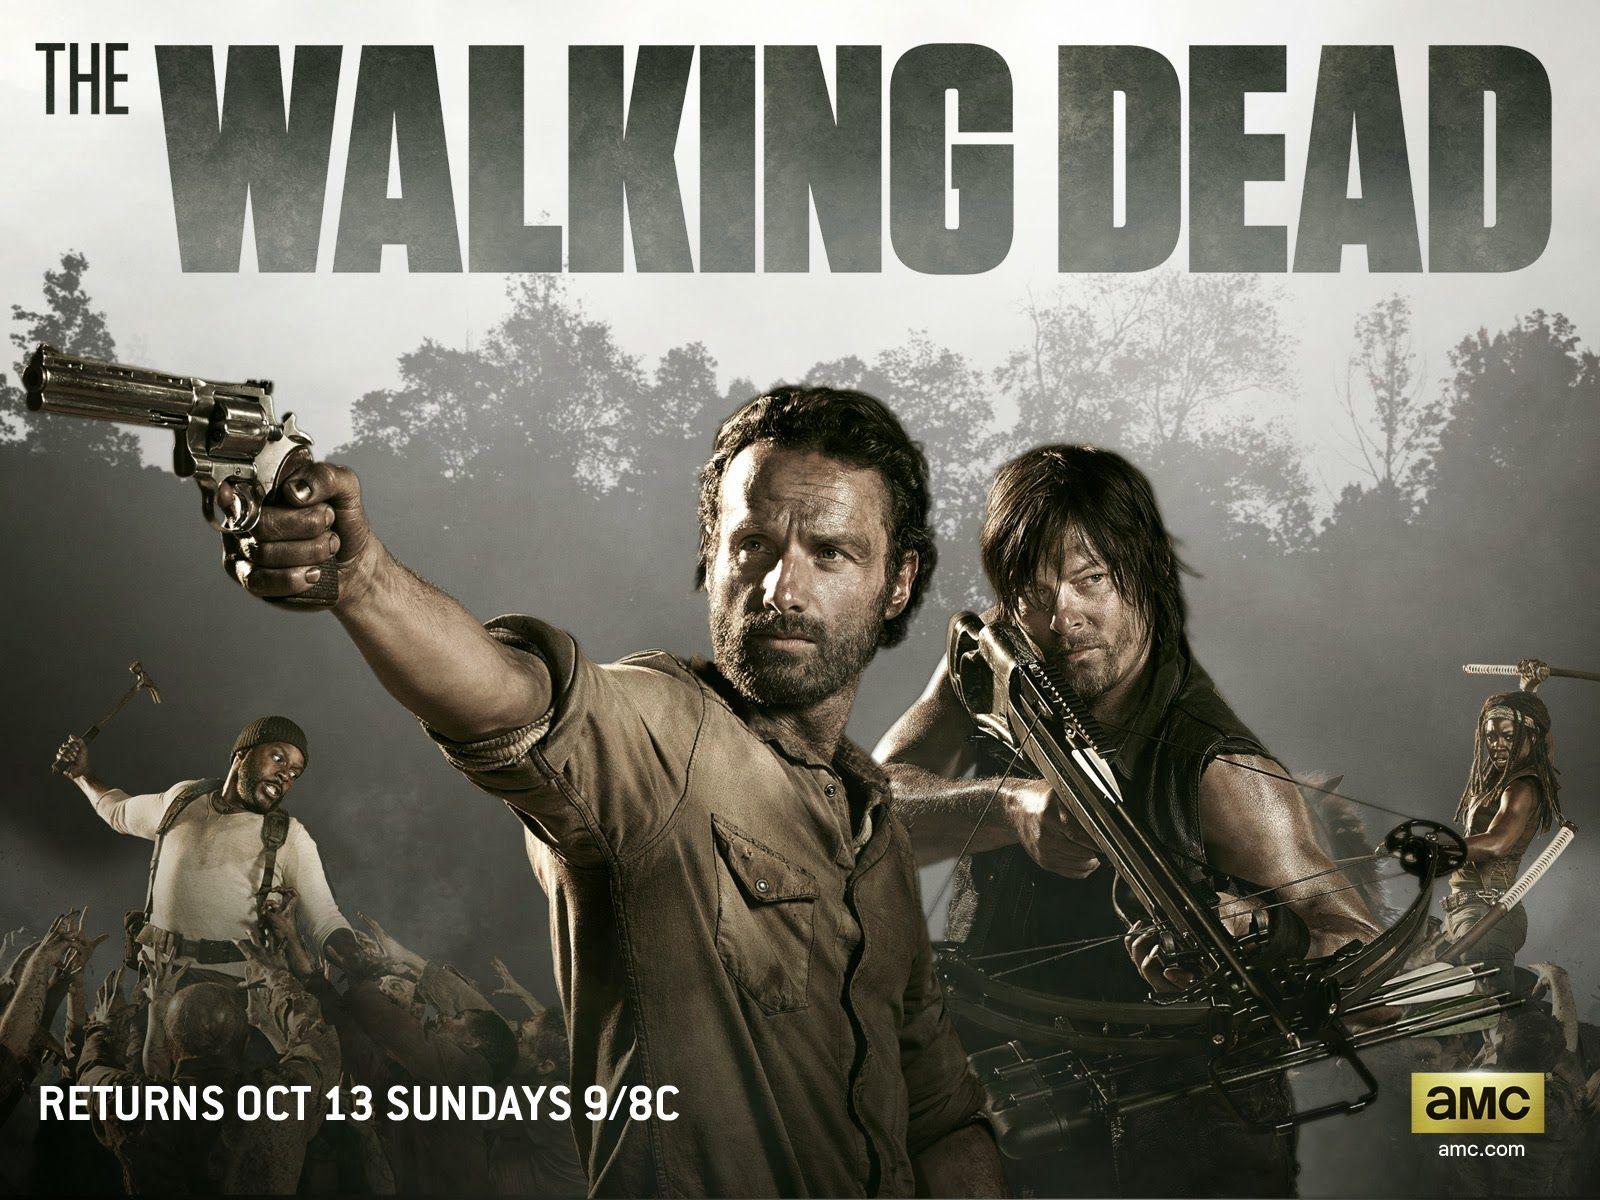 The Walking Dead - Seriado pós apocalítico zumbi